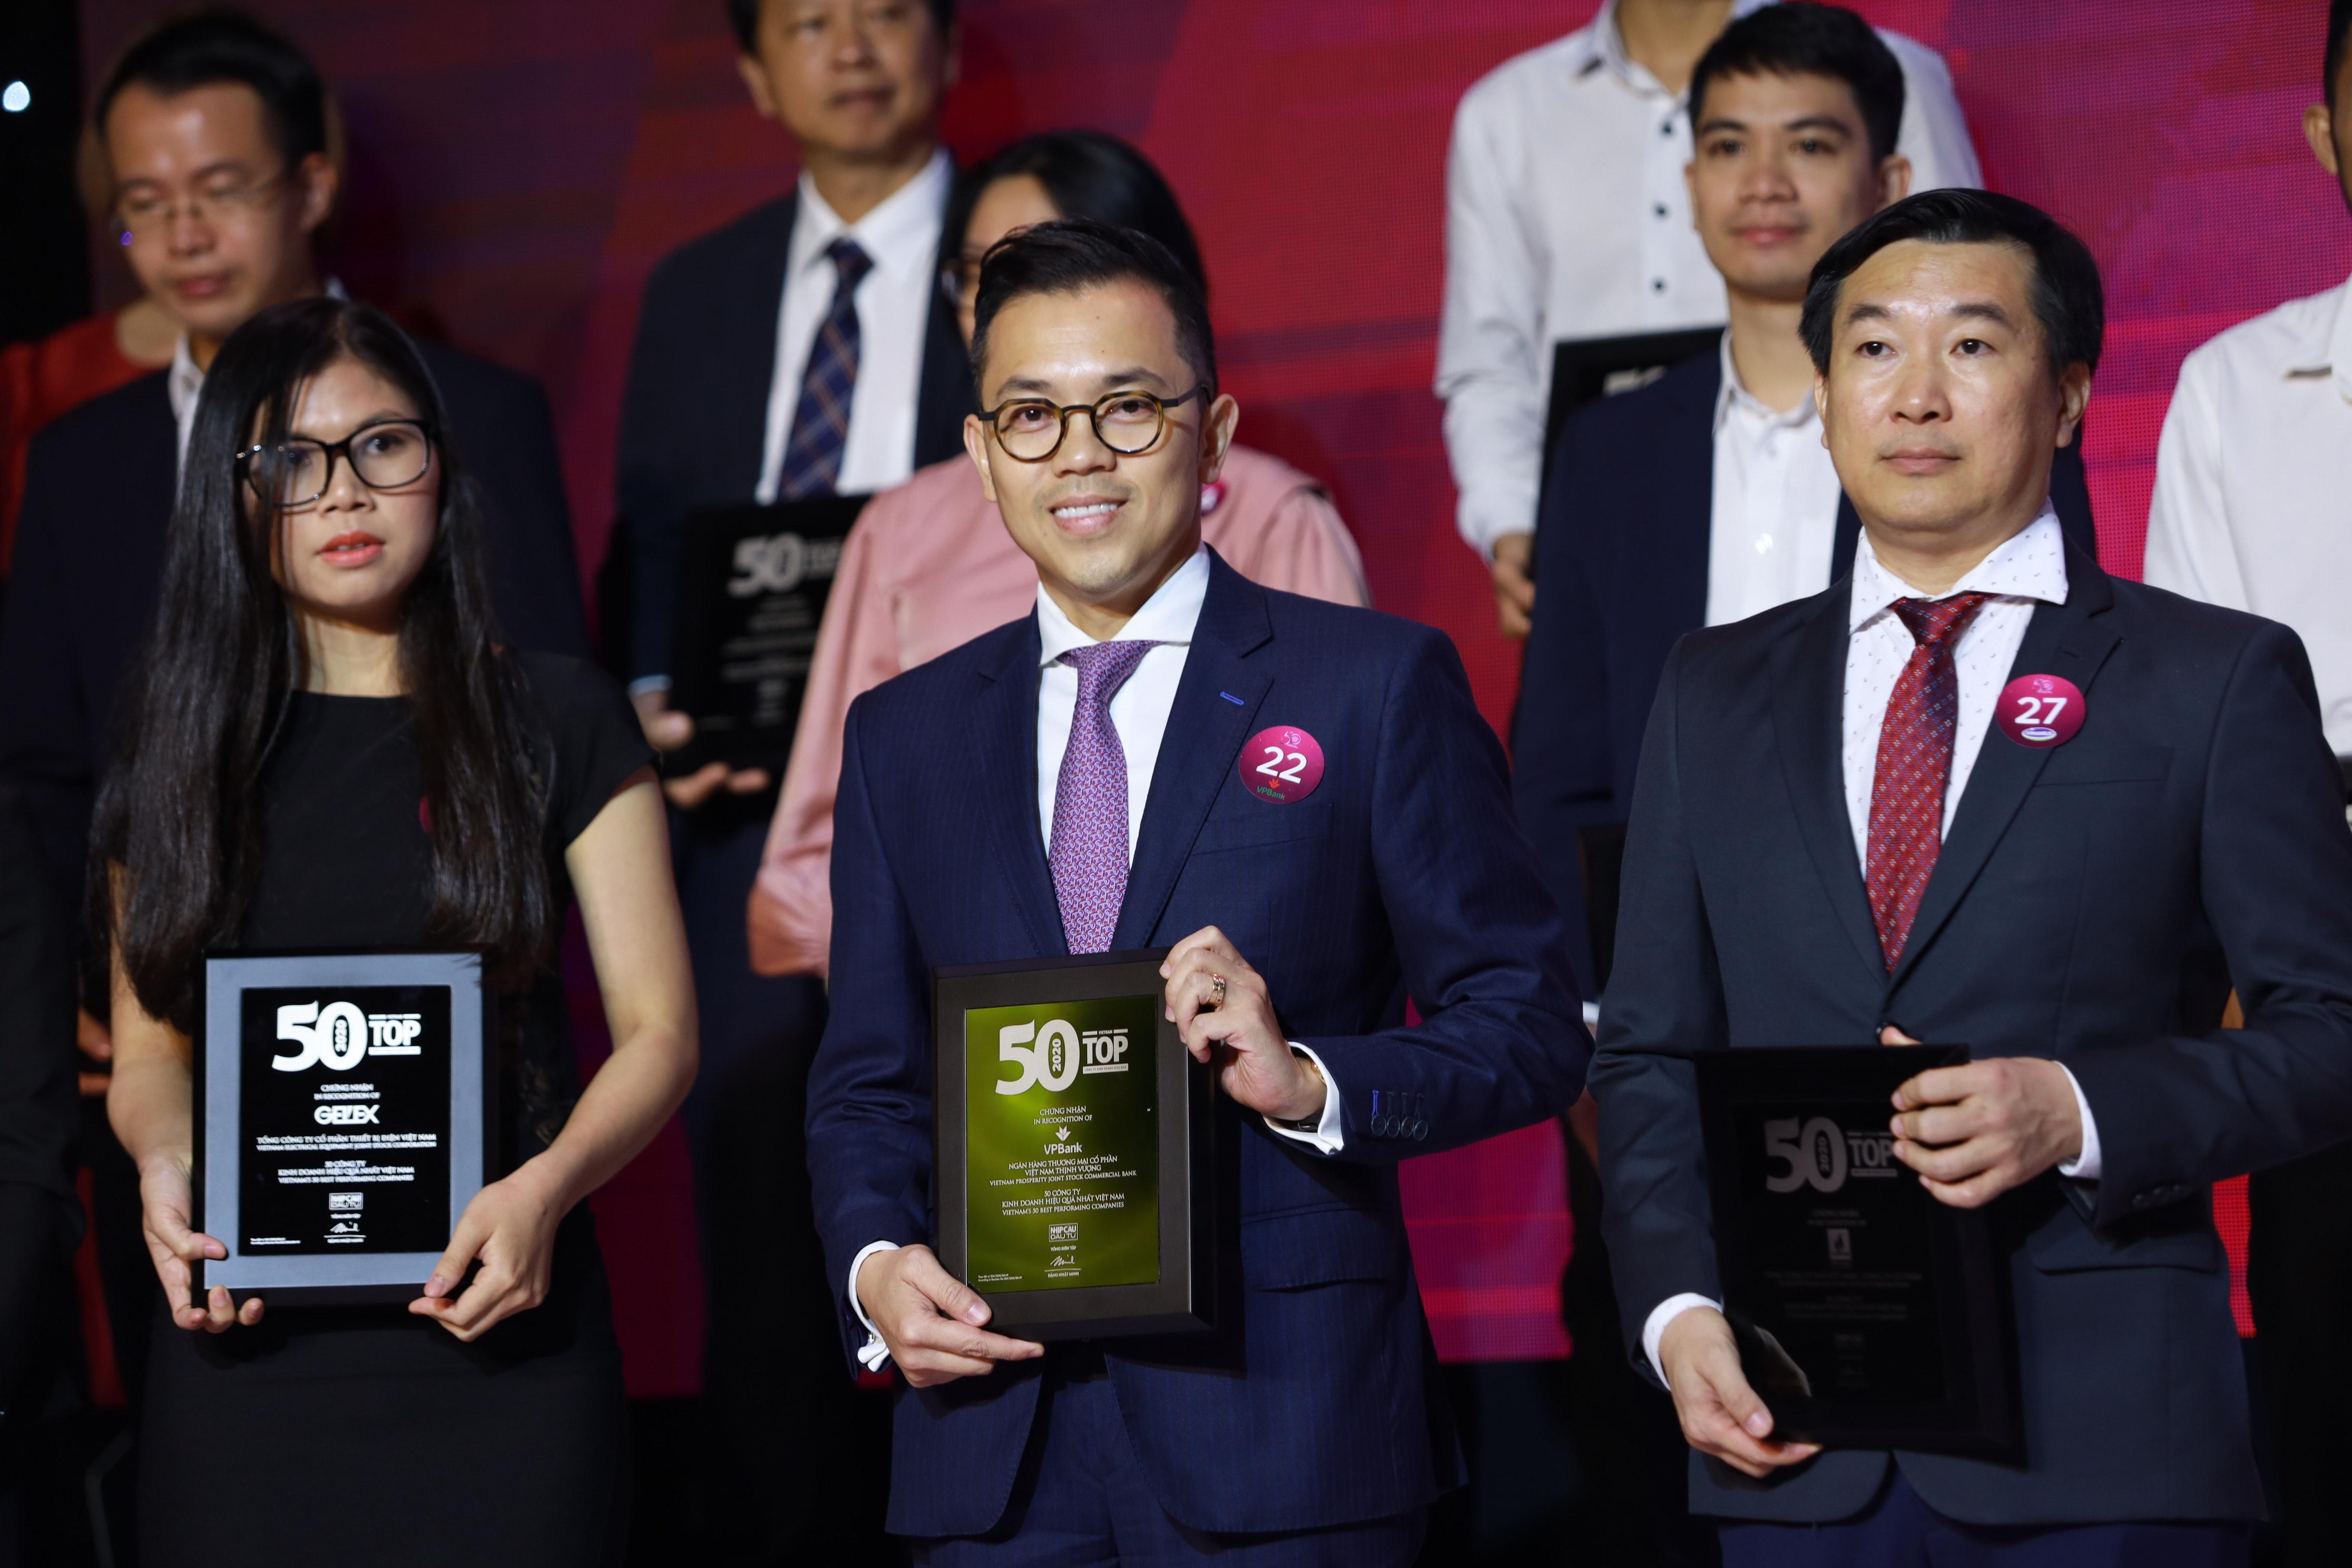 vpbank lien tiep duoc vinh danh top 50 cong ty kinh doanh hieu qua va niem yet tot nhat viet nam